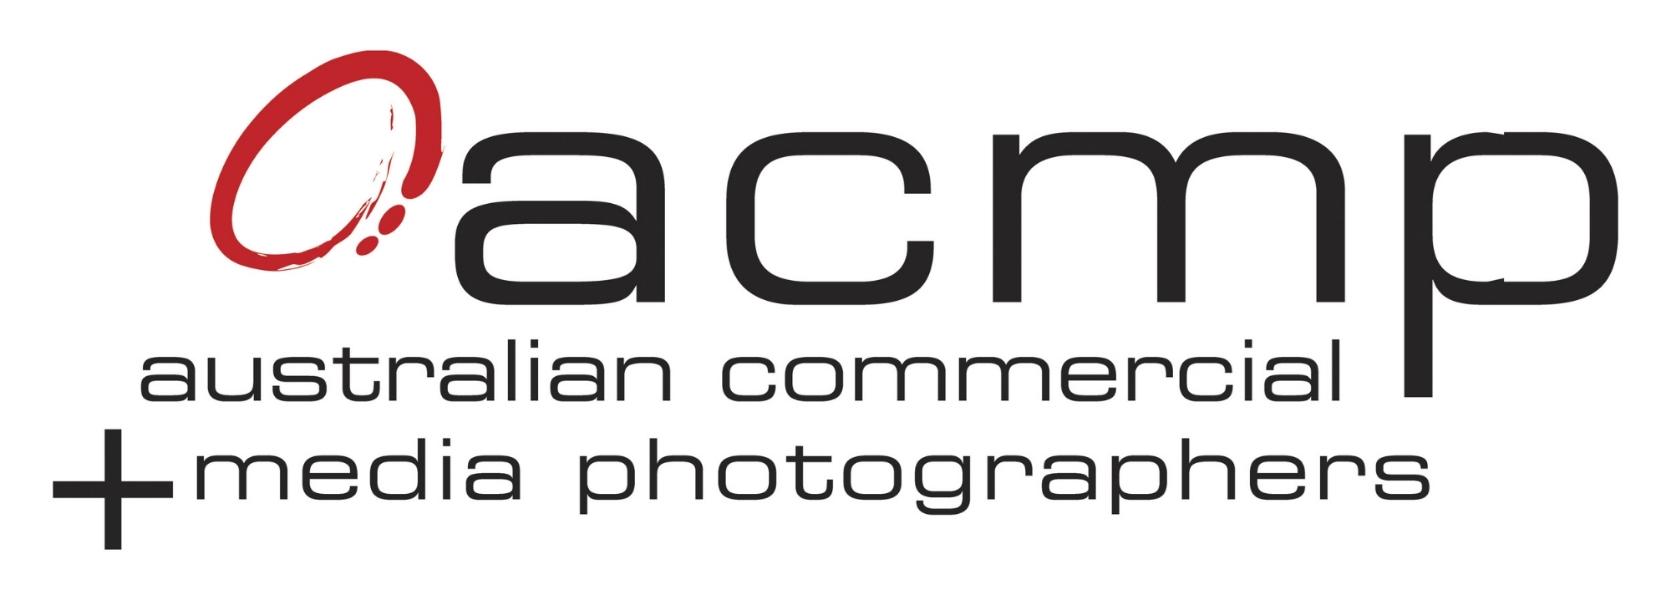 Sydney Architectural Photographer 3